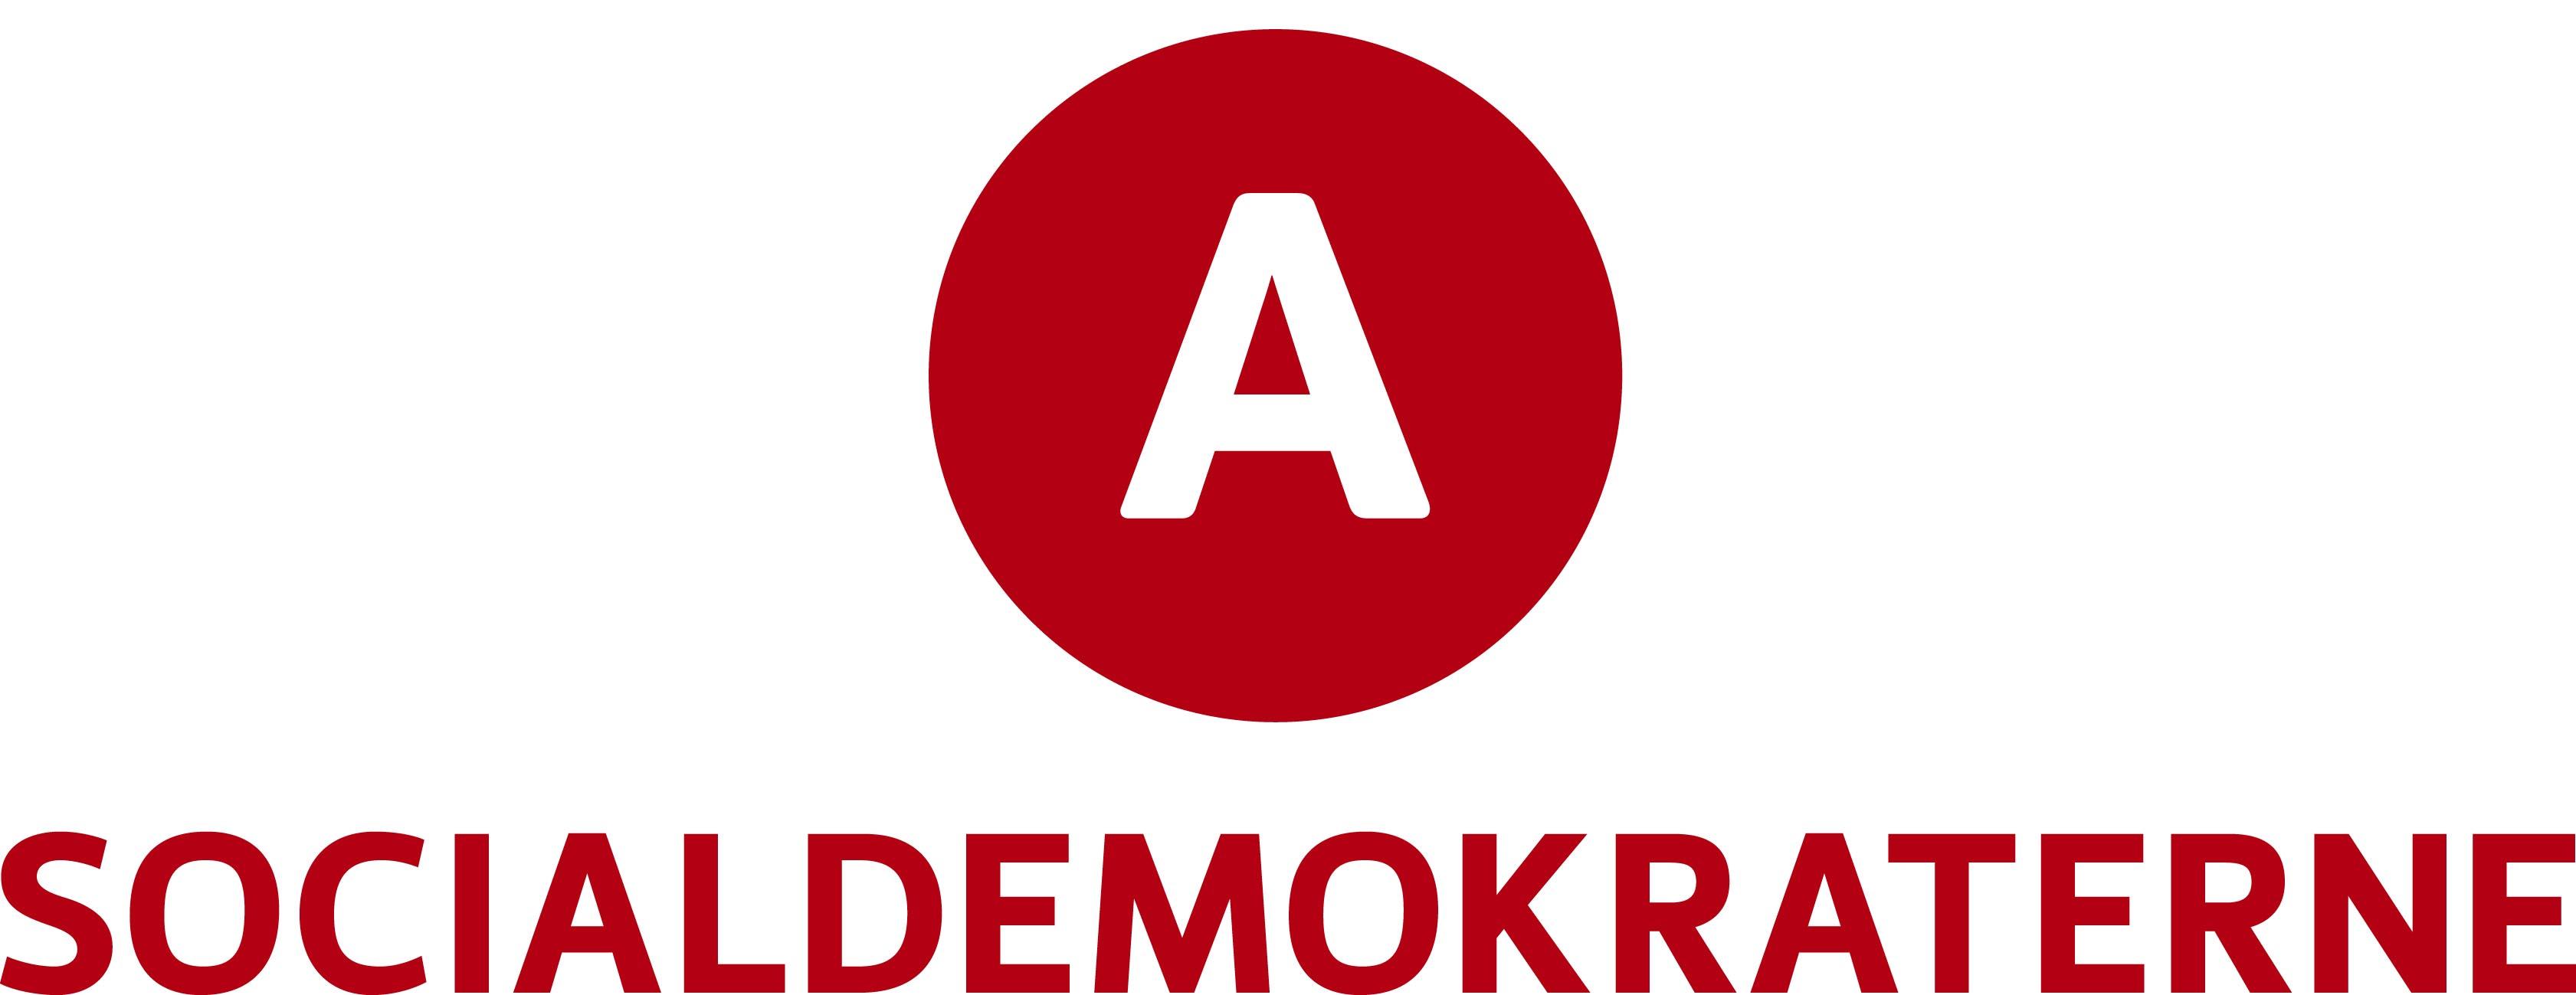 A_socialdemokraterne_r¿d